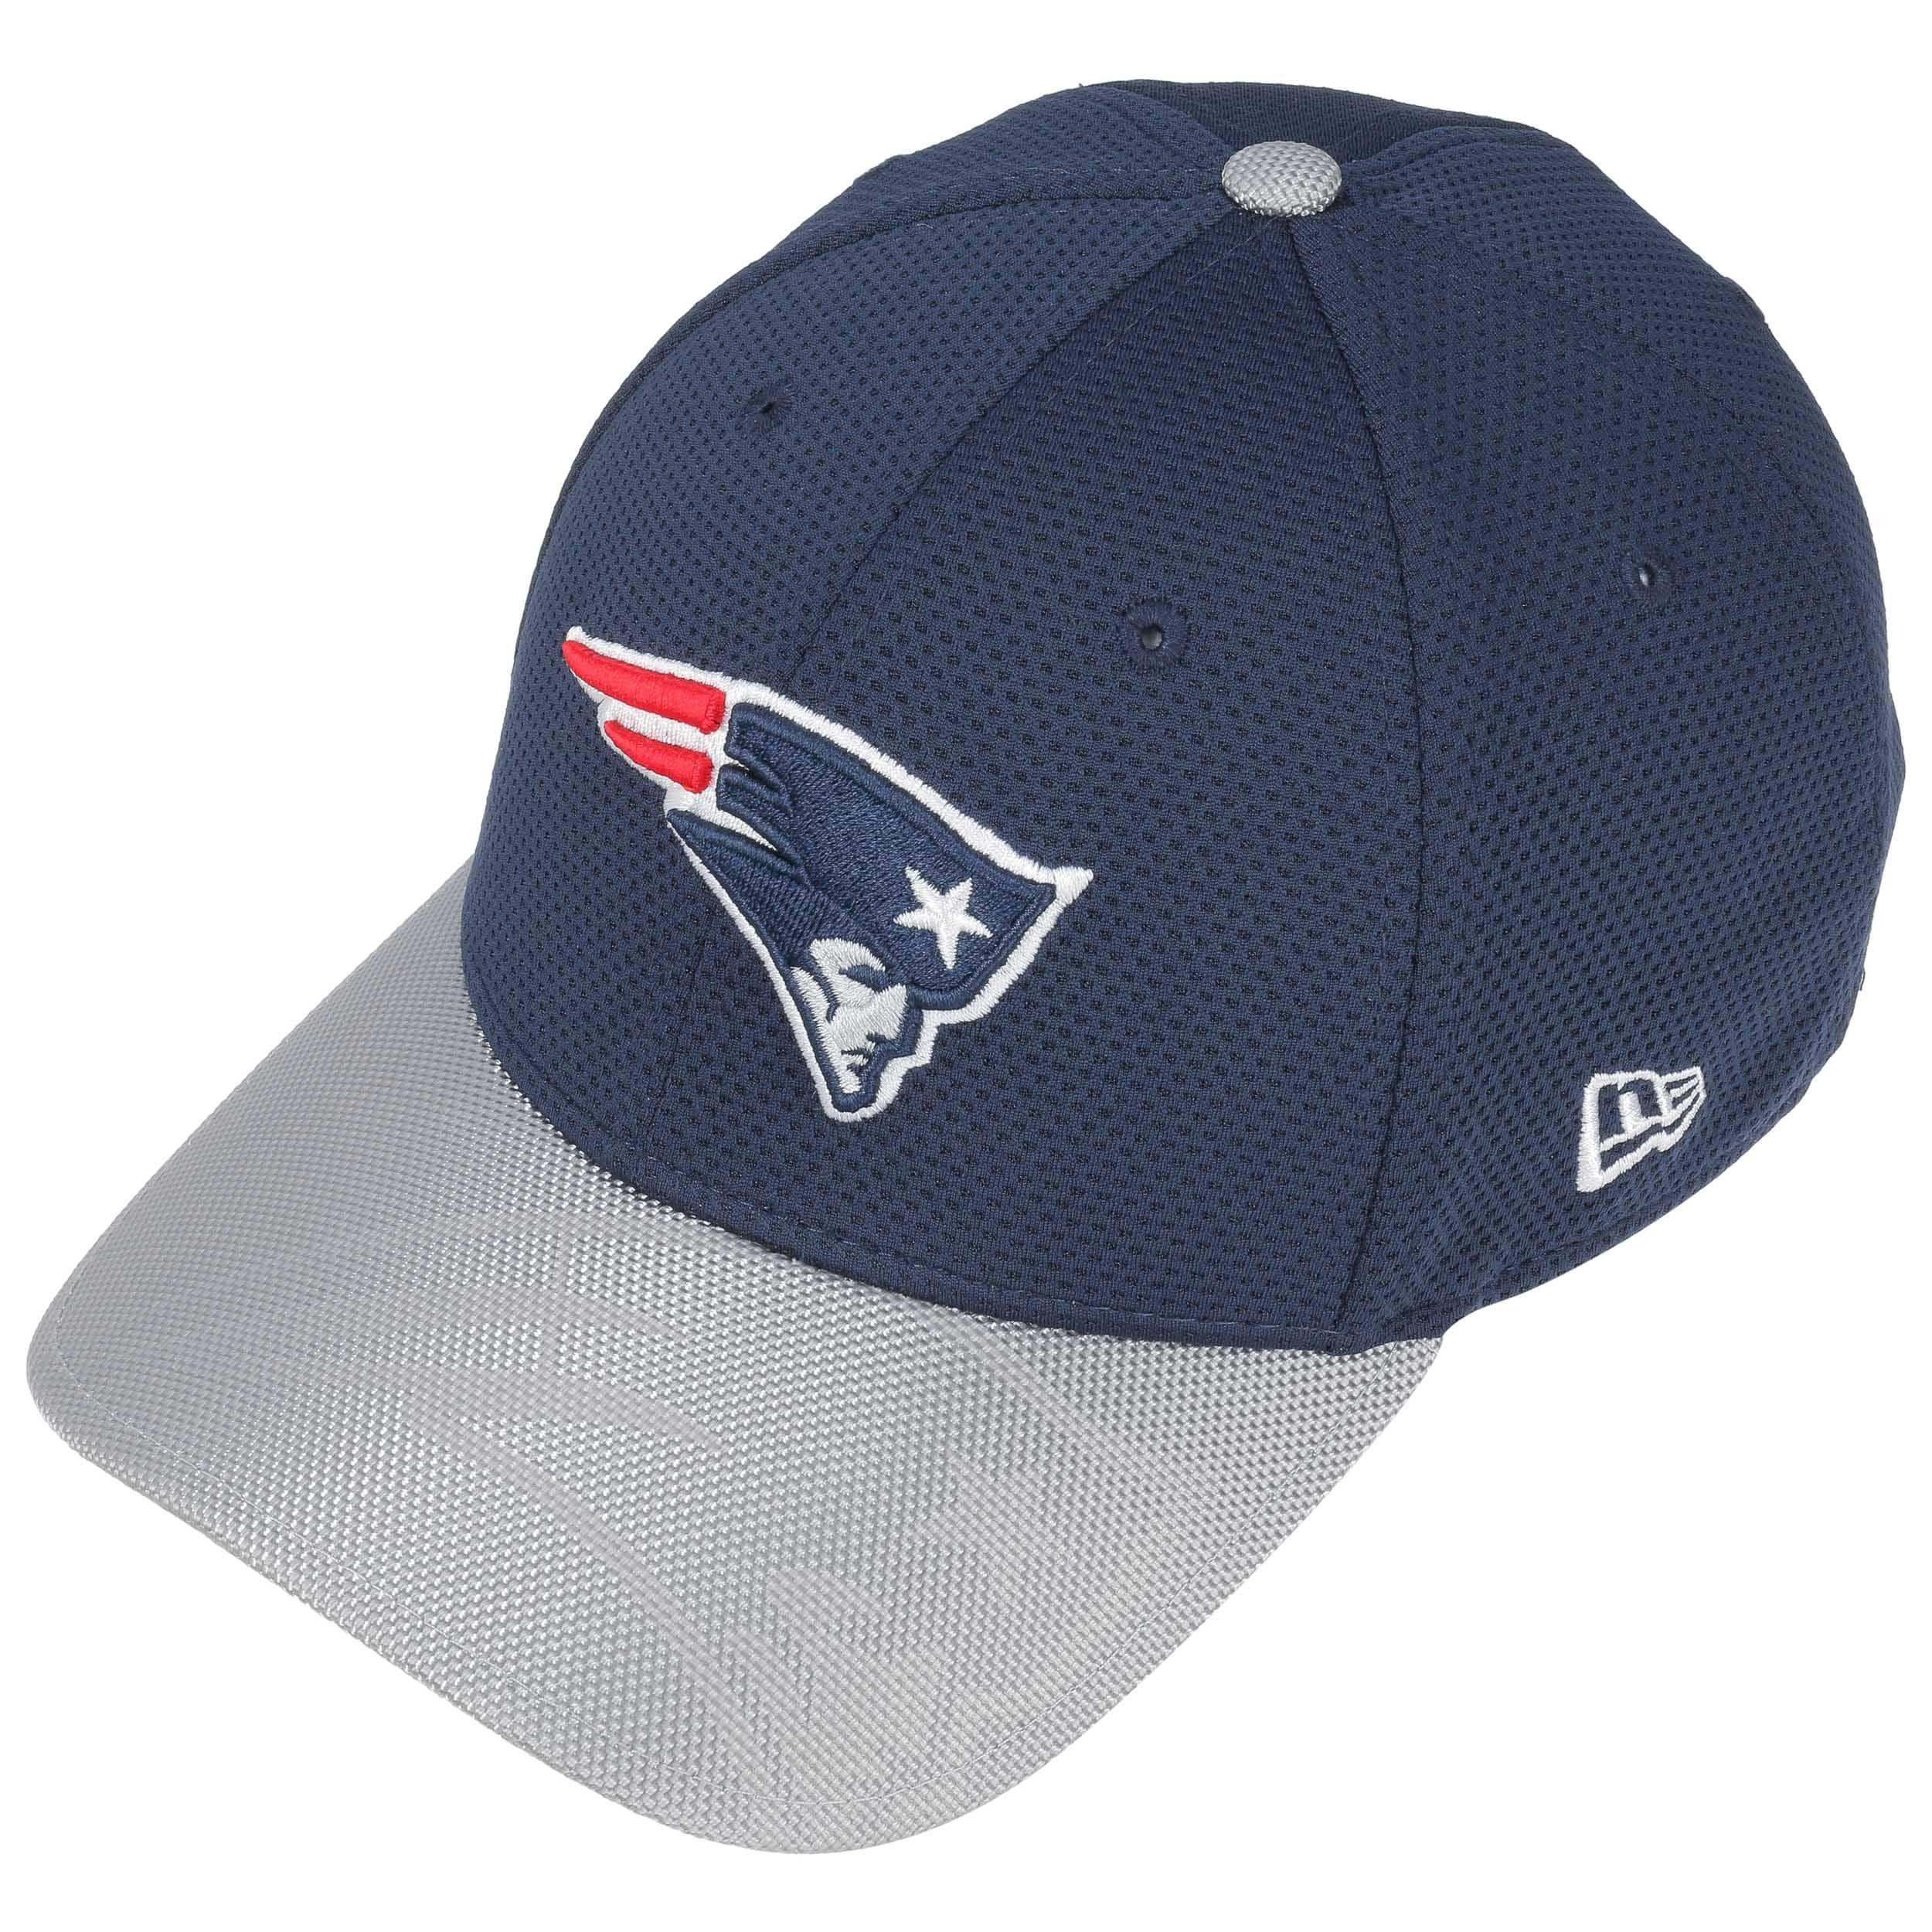 da80b8e93 39Thirty Patriots NFL Cap by New Era - blue 1 ...